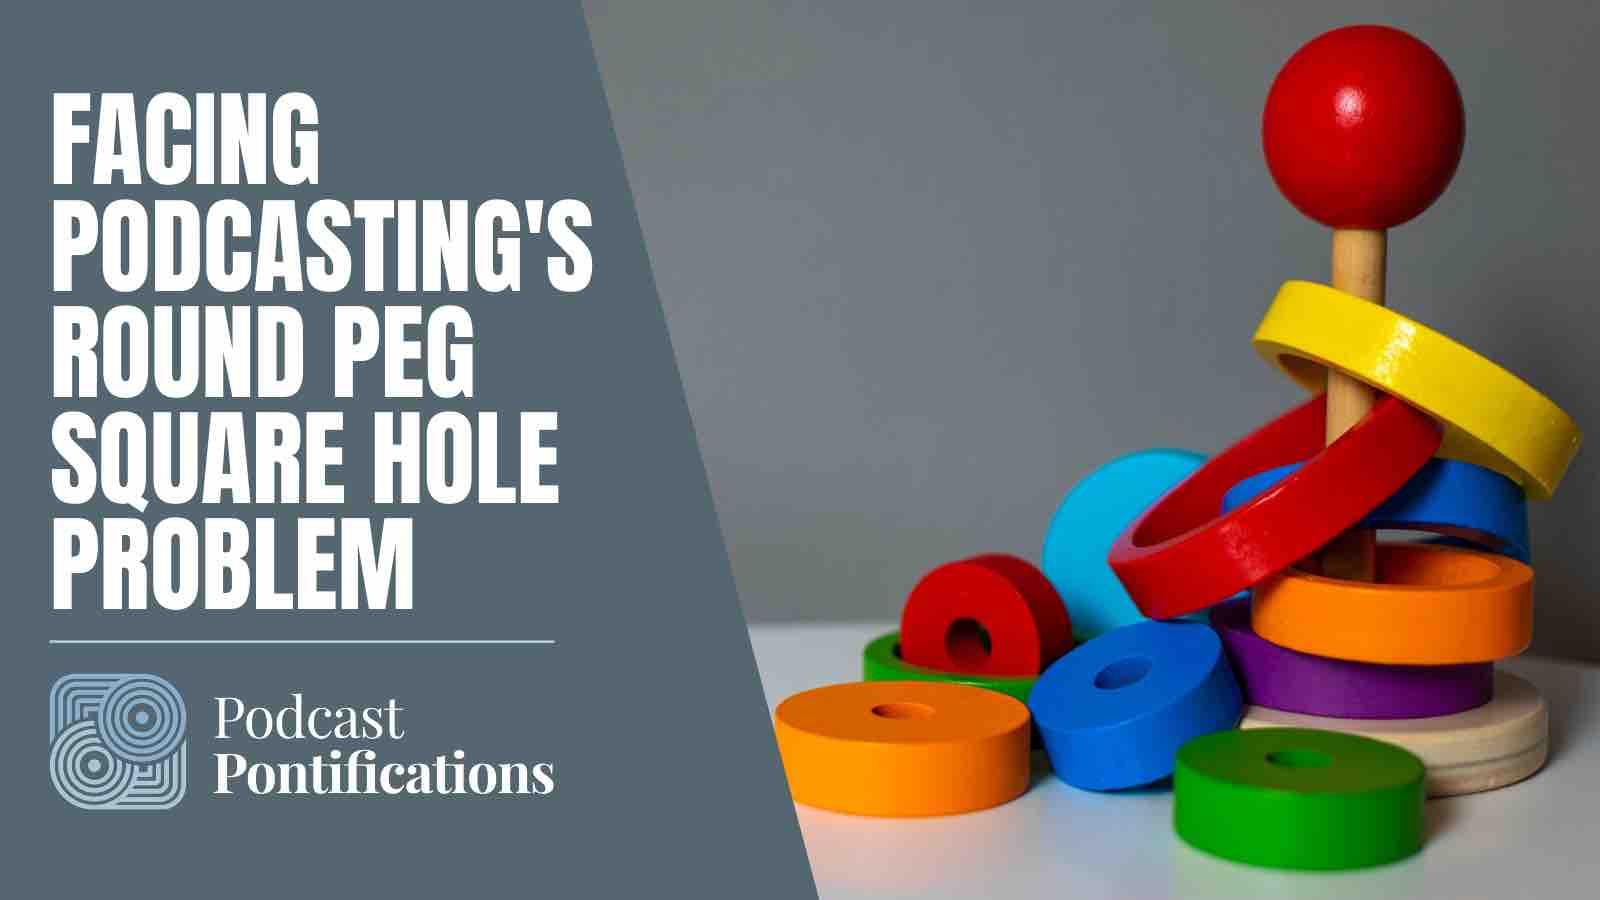 Facing Podcasting's Round Peg Square Hole Problem